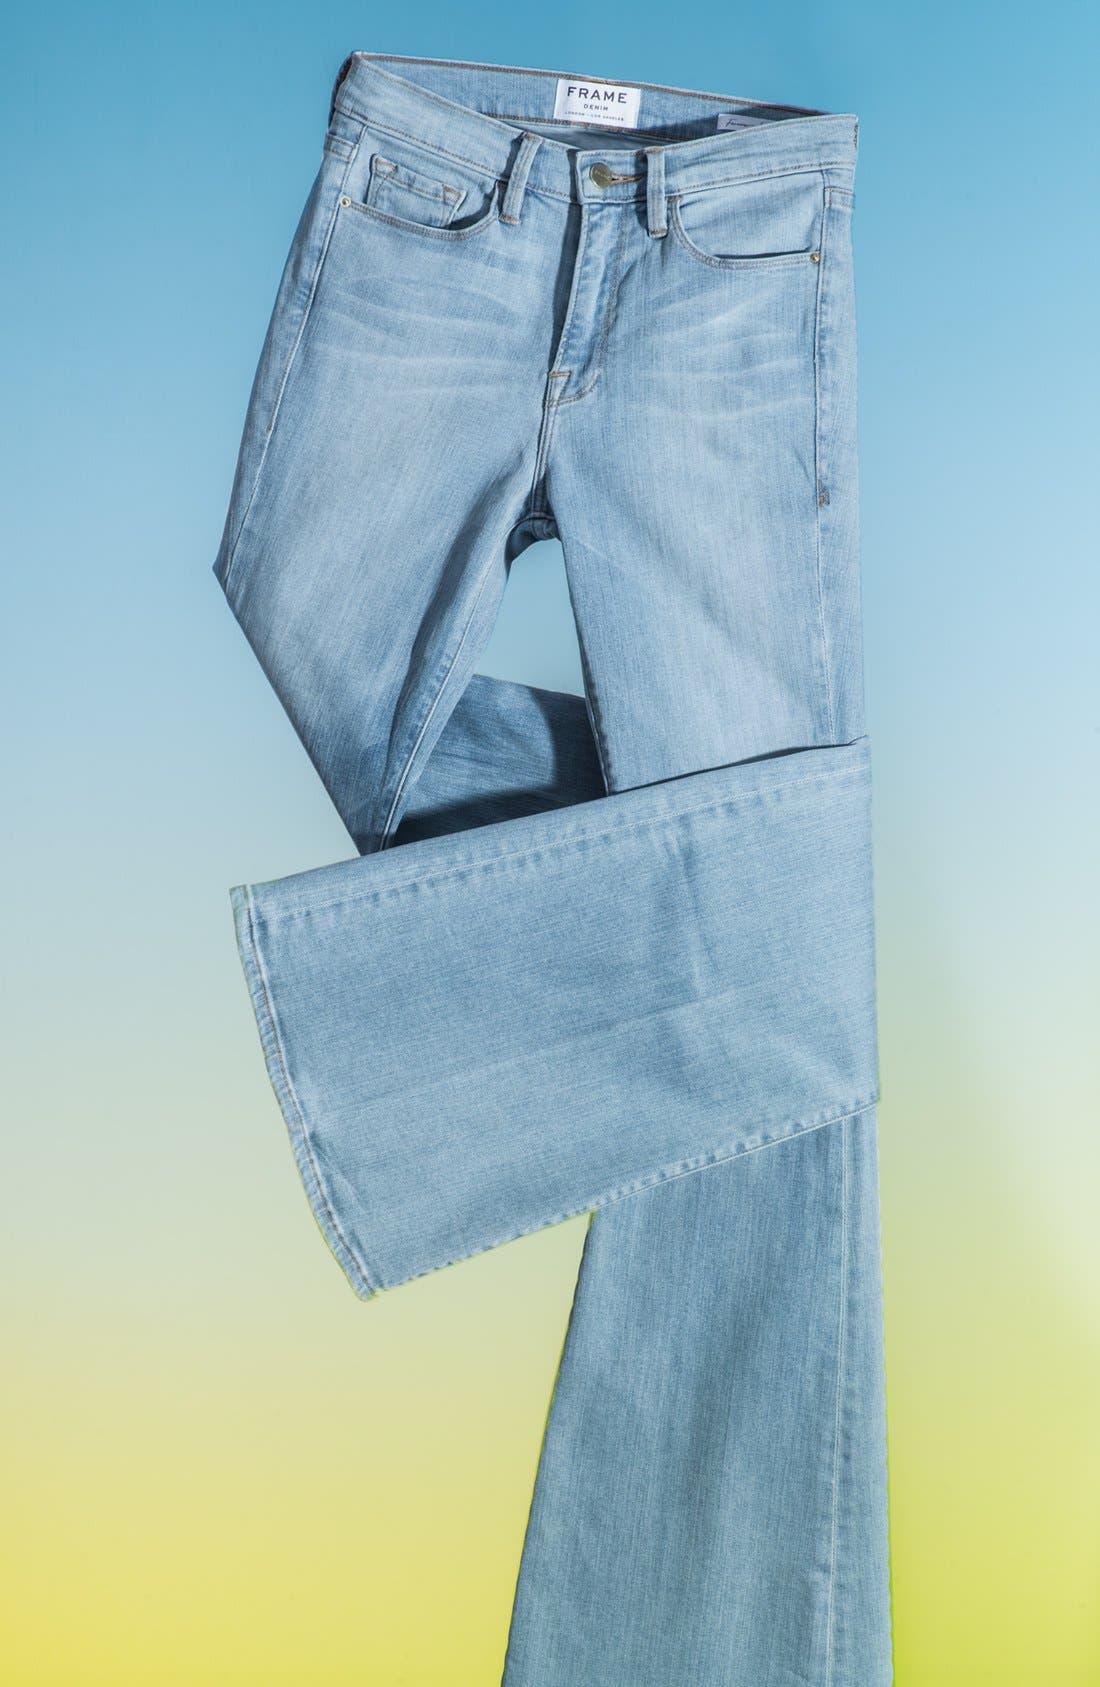 Alternate Image 1 Selected - Frame Denim 'Forever Karlie' Flared Jeans (Redchurch Street)